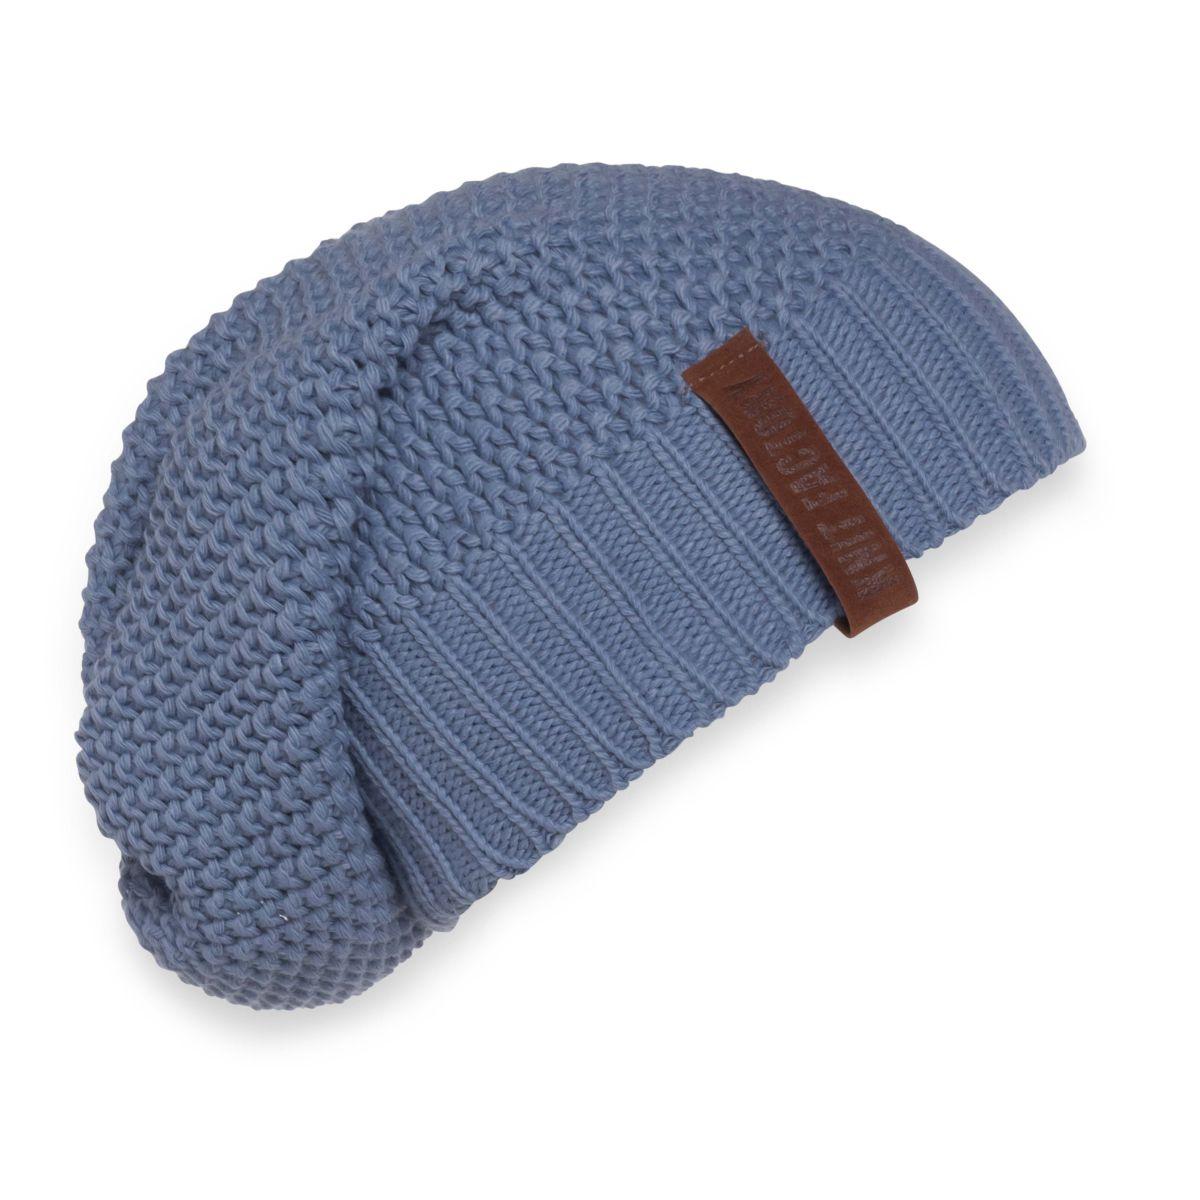 knit factory 1207032 coco beanie indigo 1